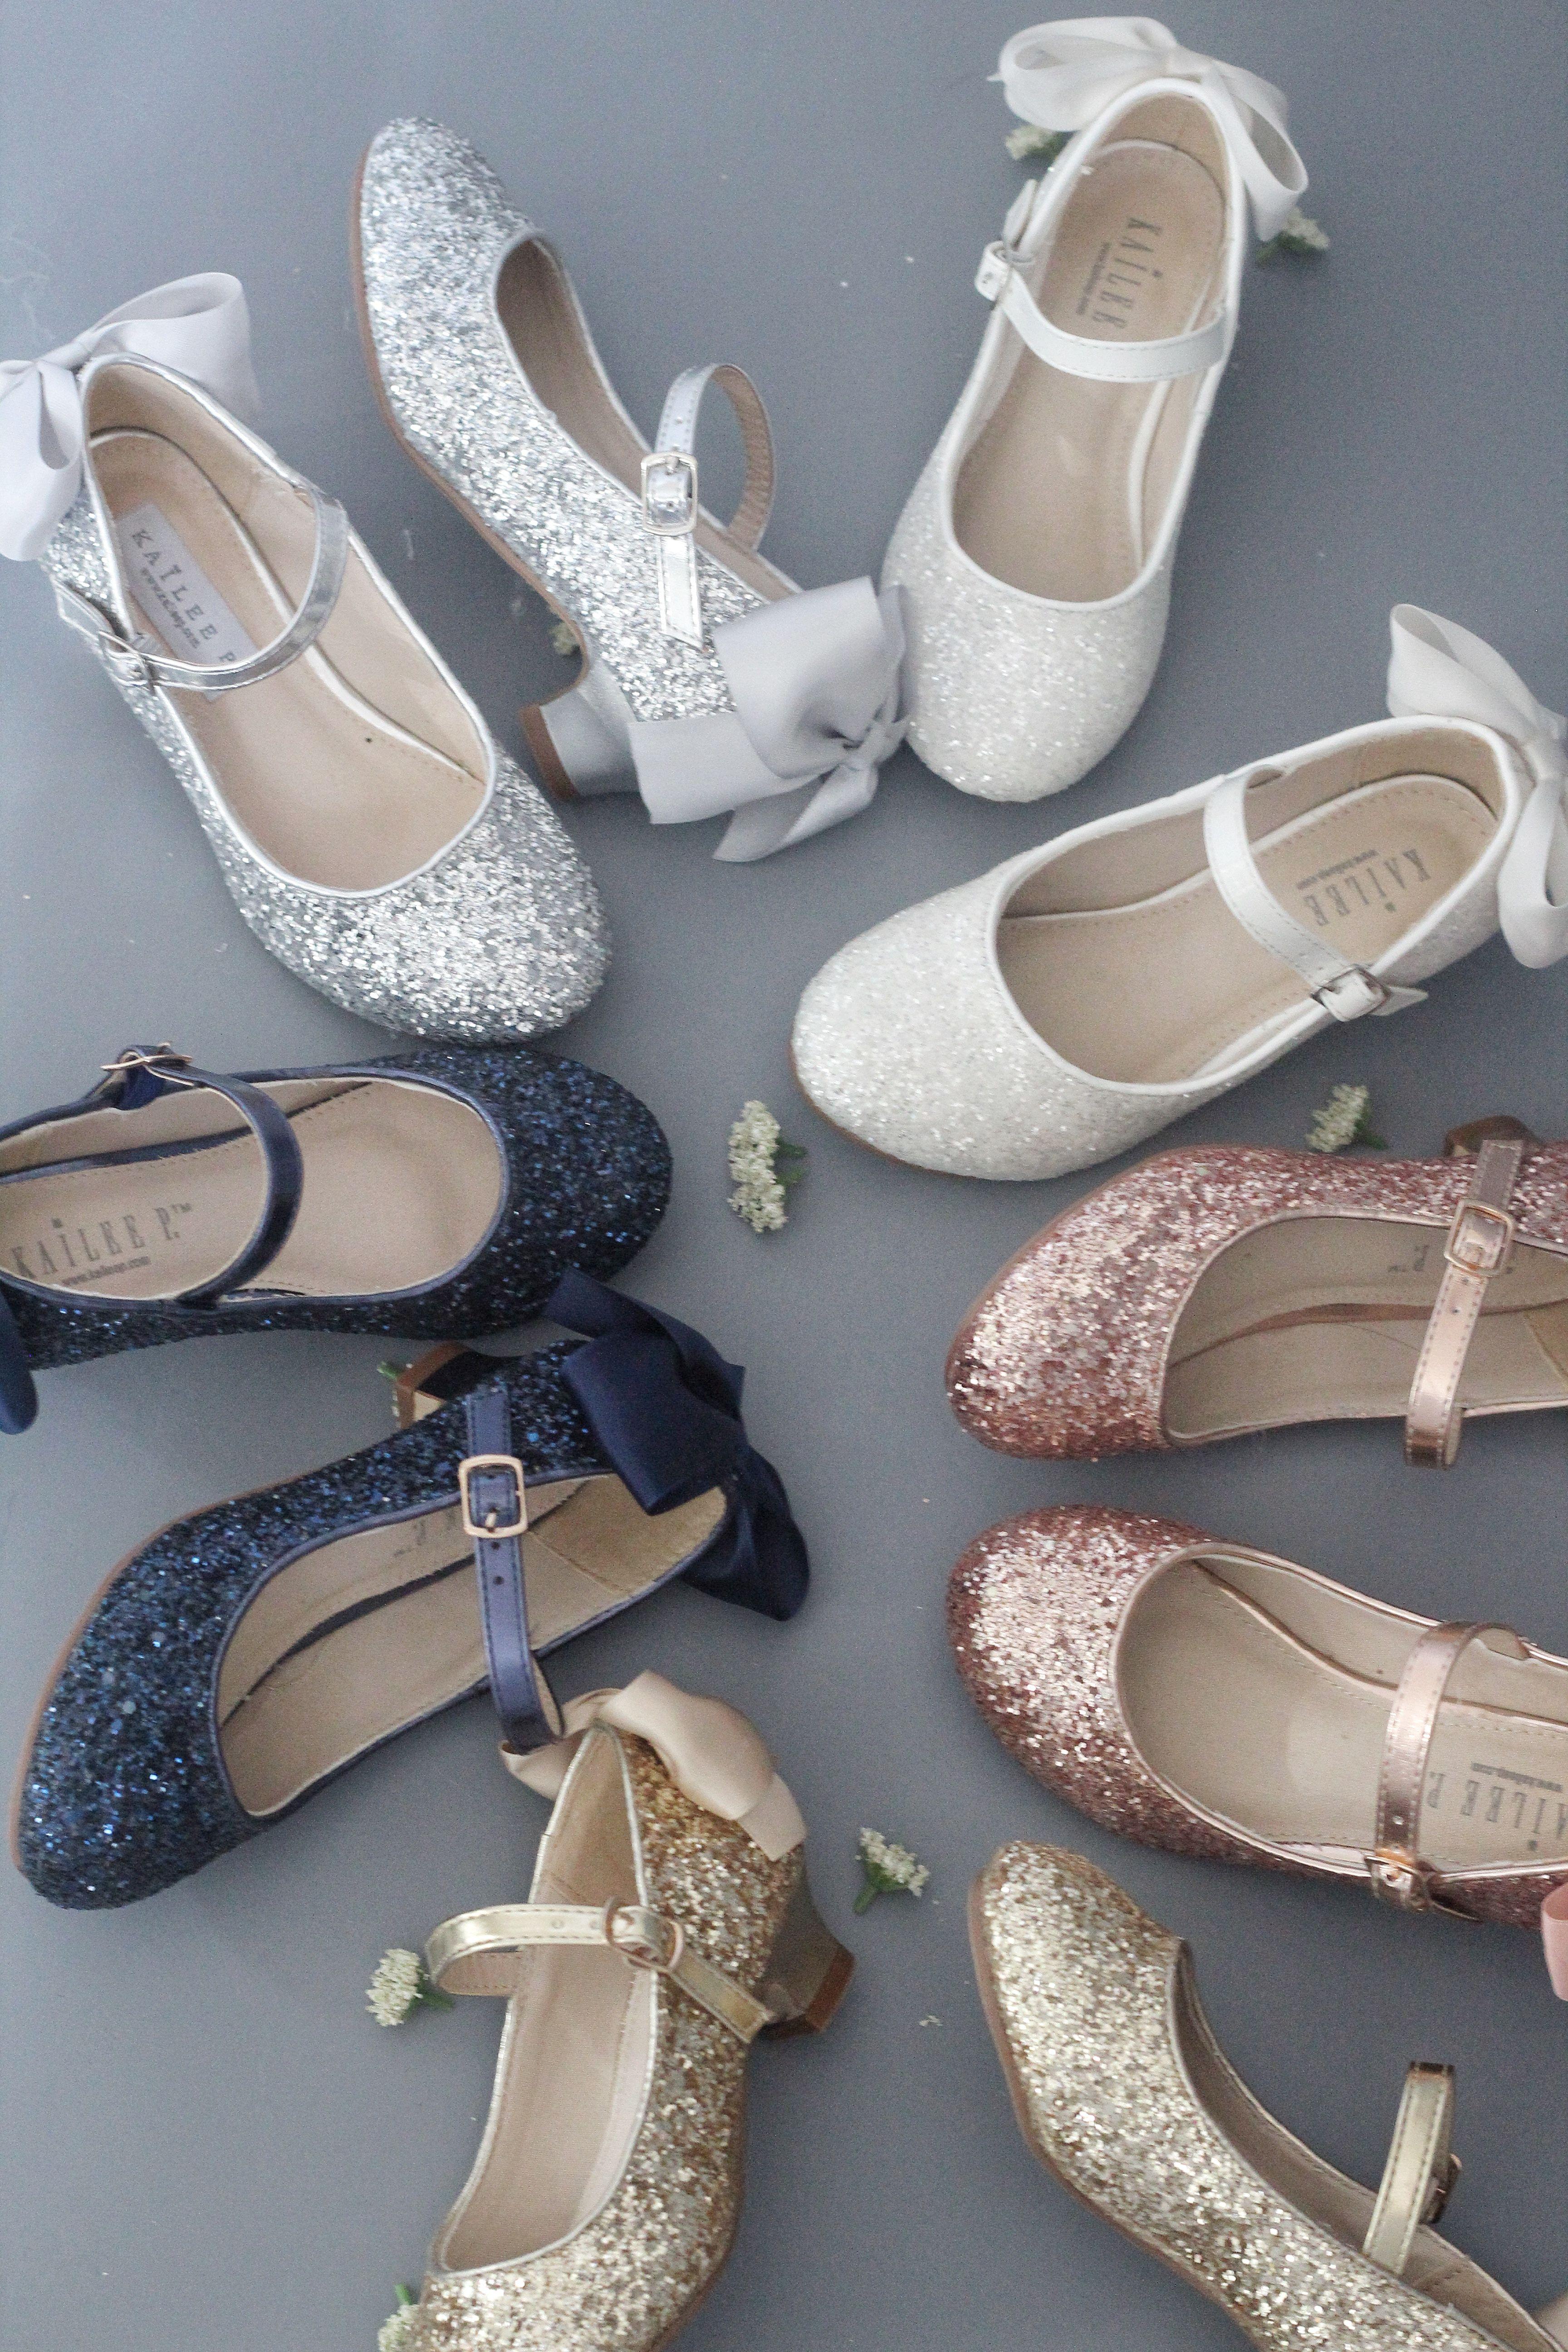 Gold rock glitter maryjane heels with satin bow flower